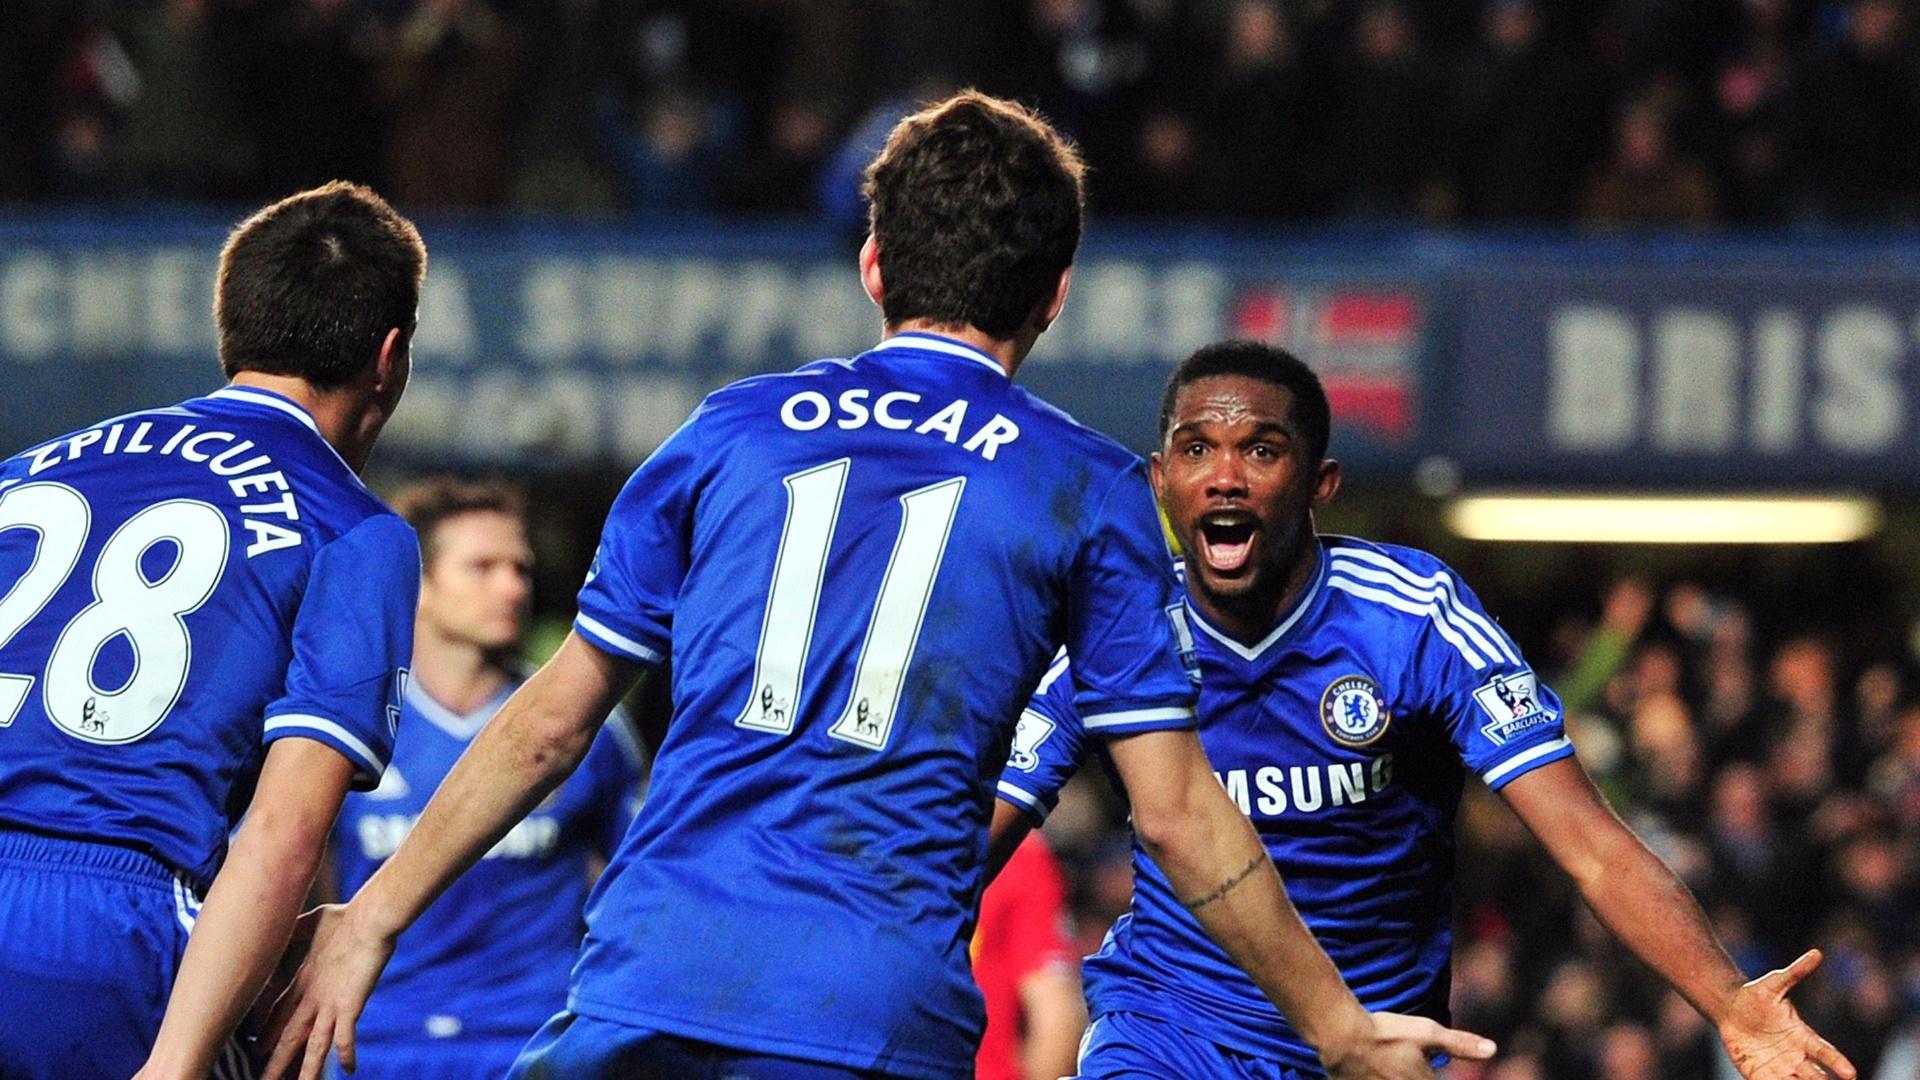 29.dez.2013 - Samuel Eto'o comemora o gol marcado pelo Chelsea